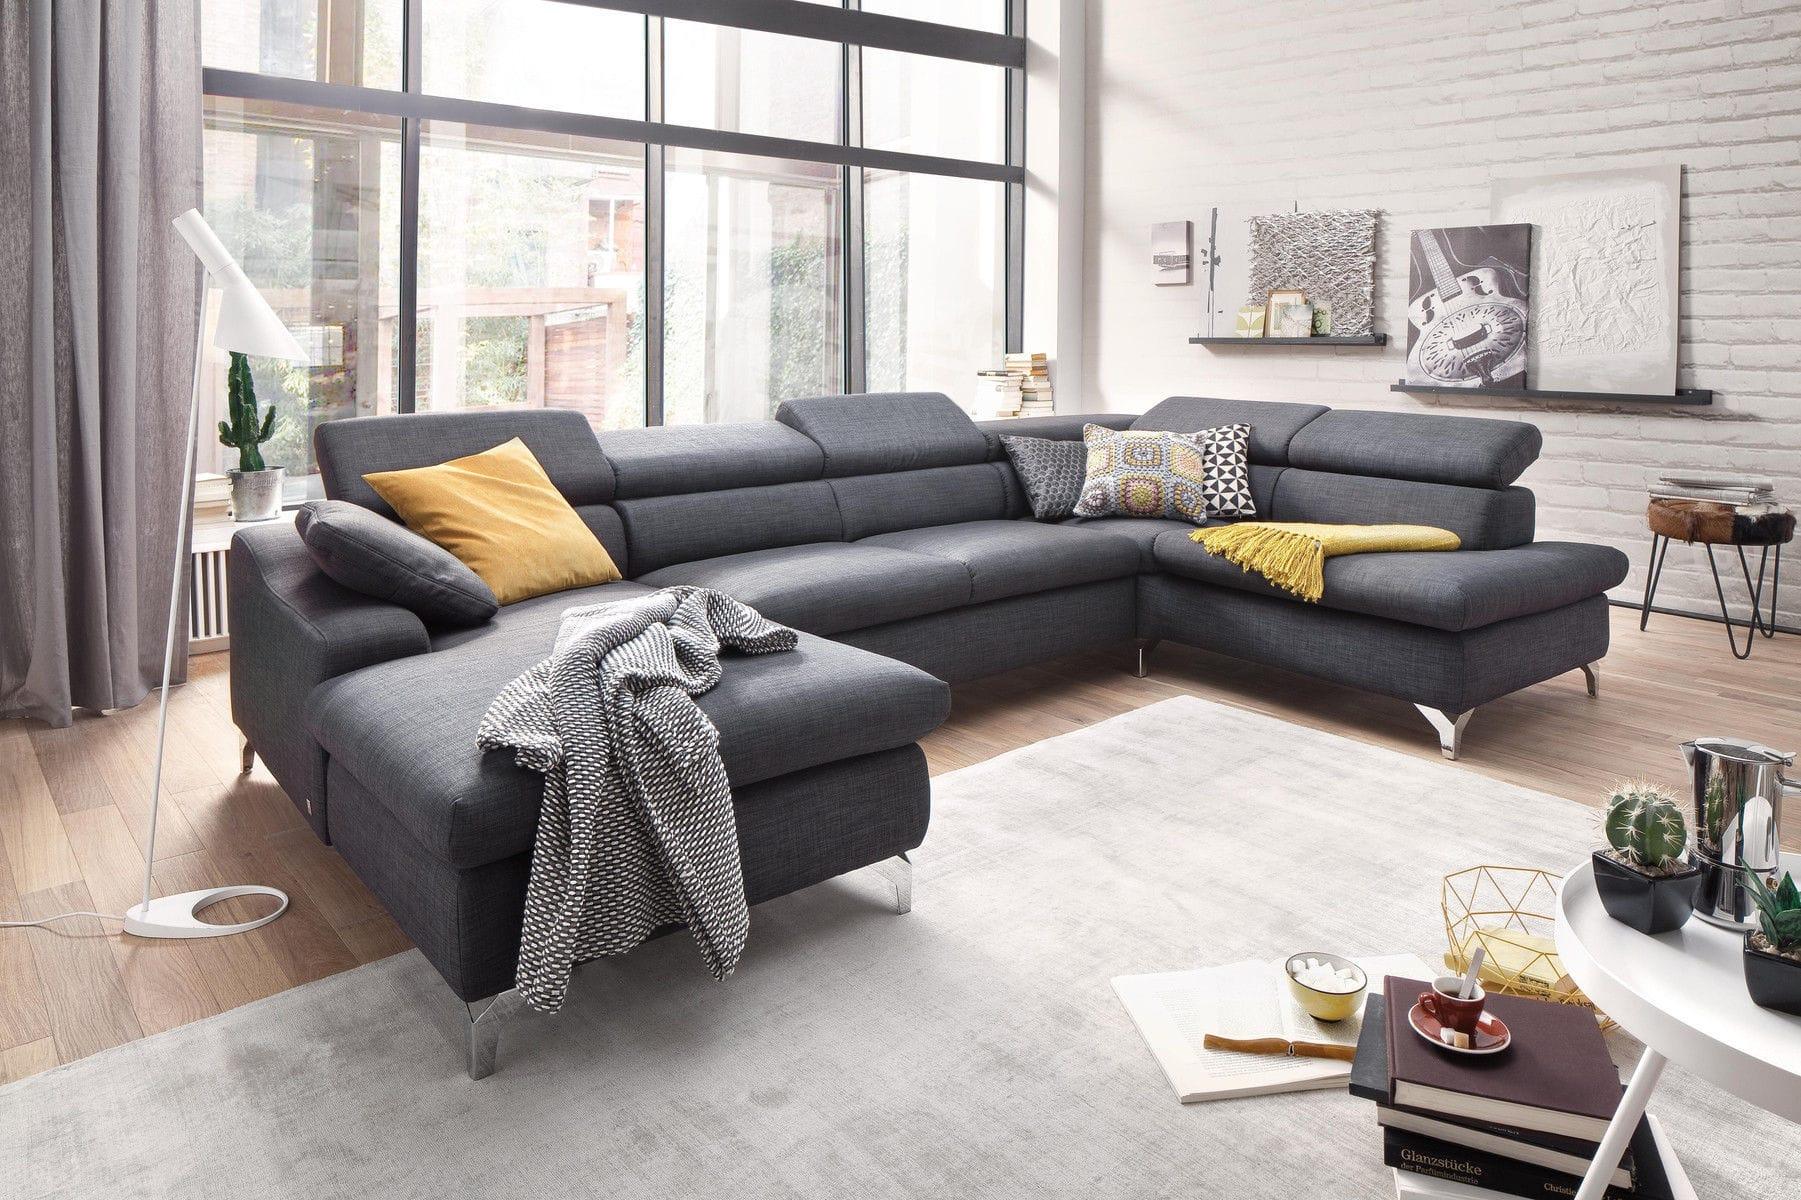 Modulierbares Sofa Modern Stoff Leder Mr 4775 Musterring